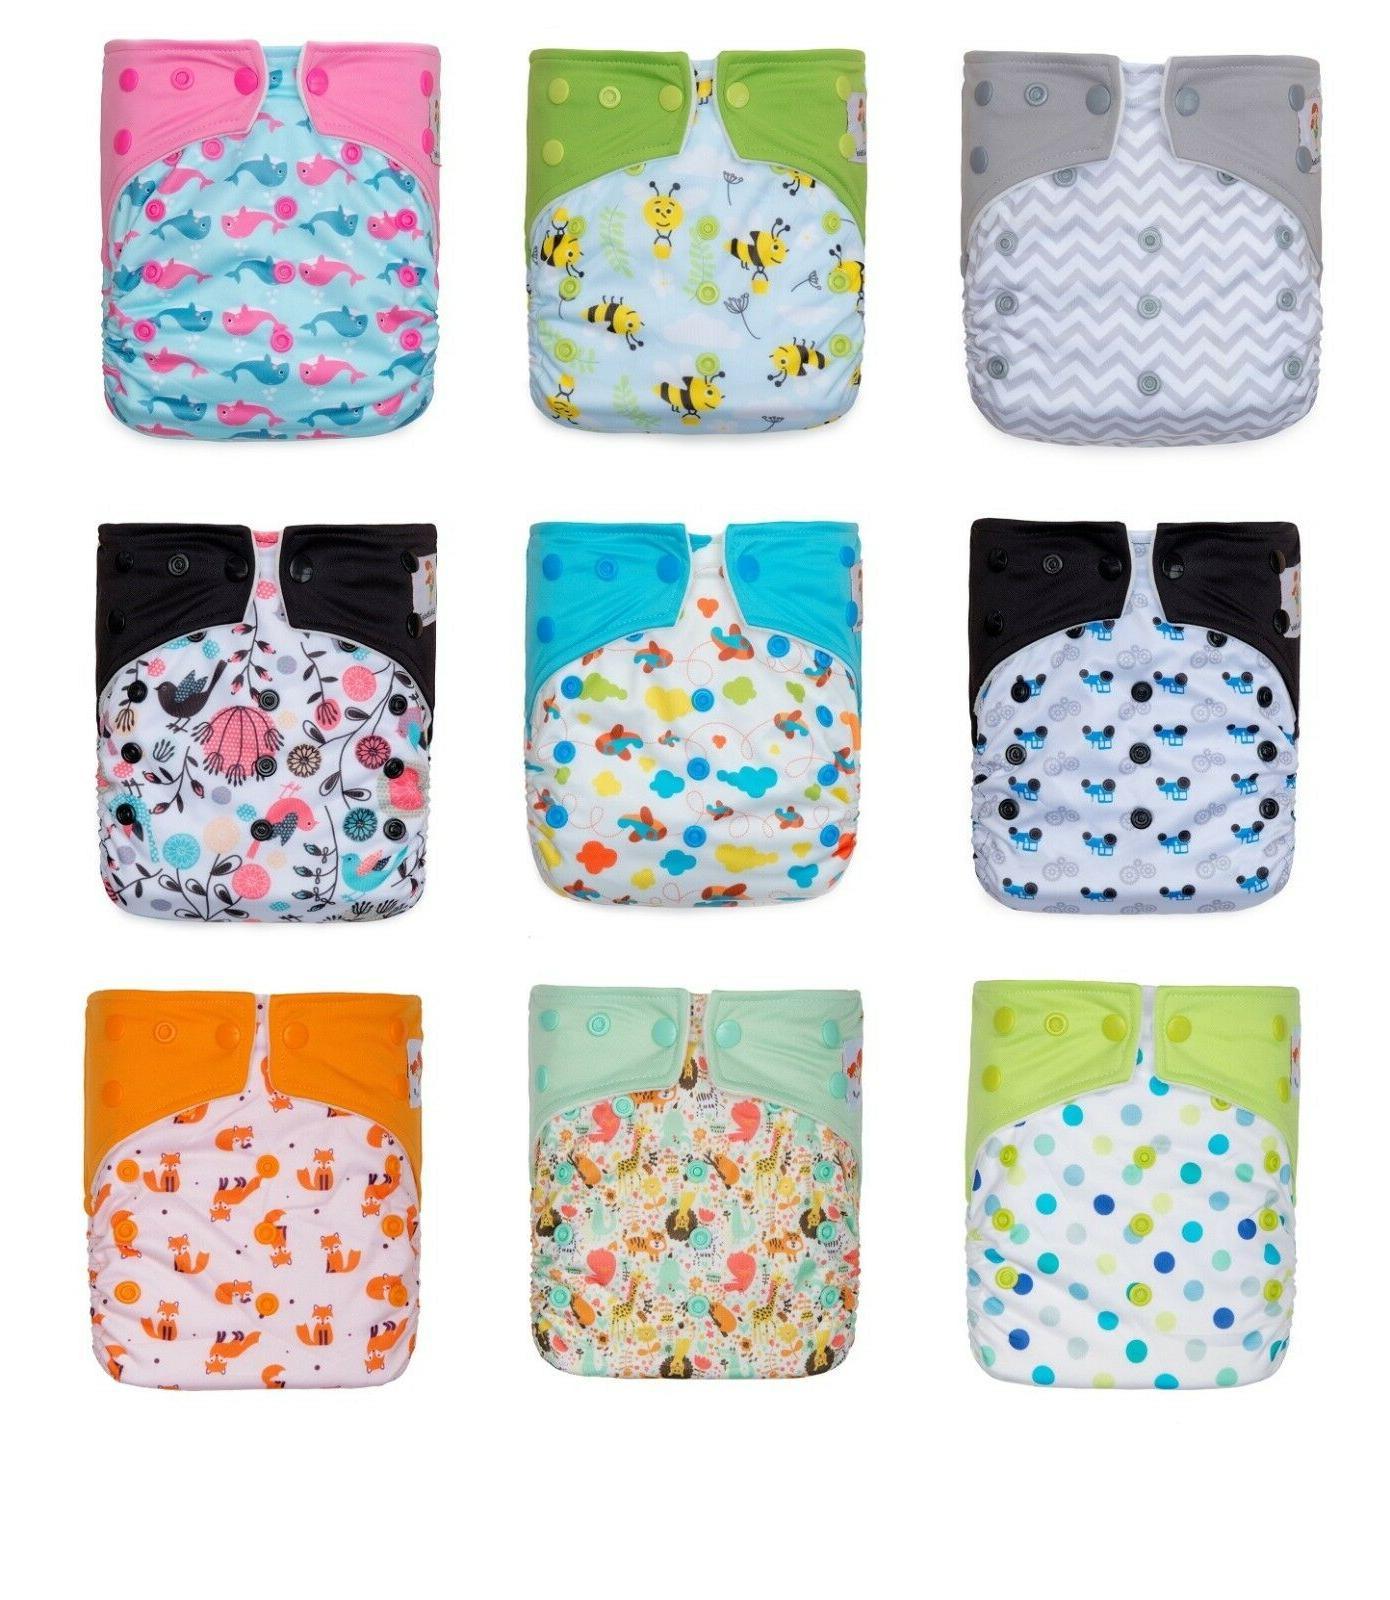 printed cloth diaper snap closure 2 microfiber